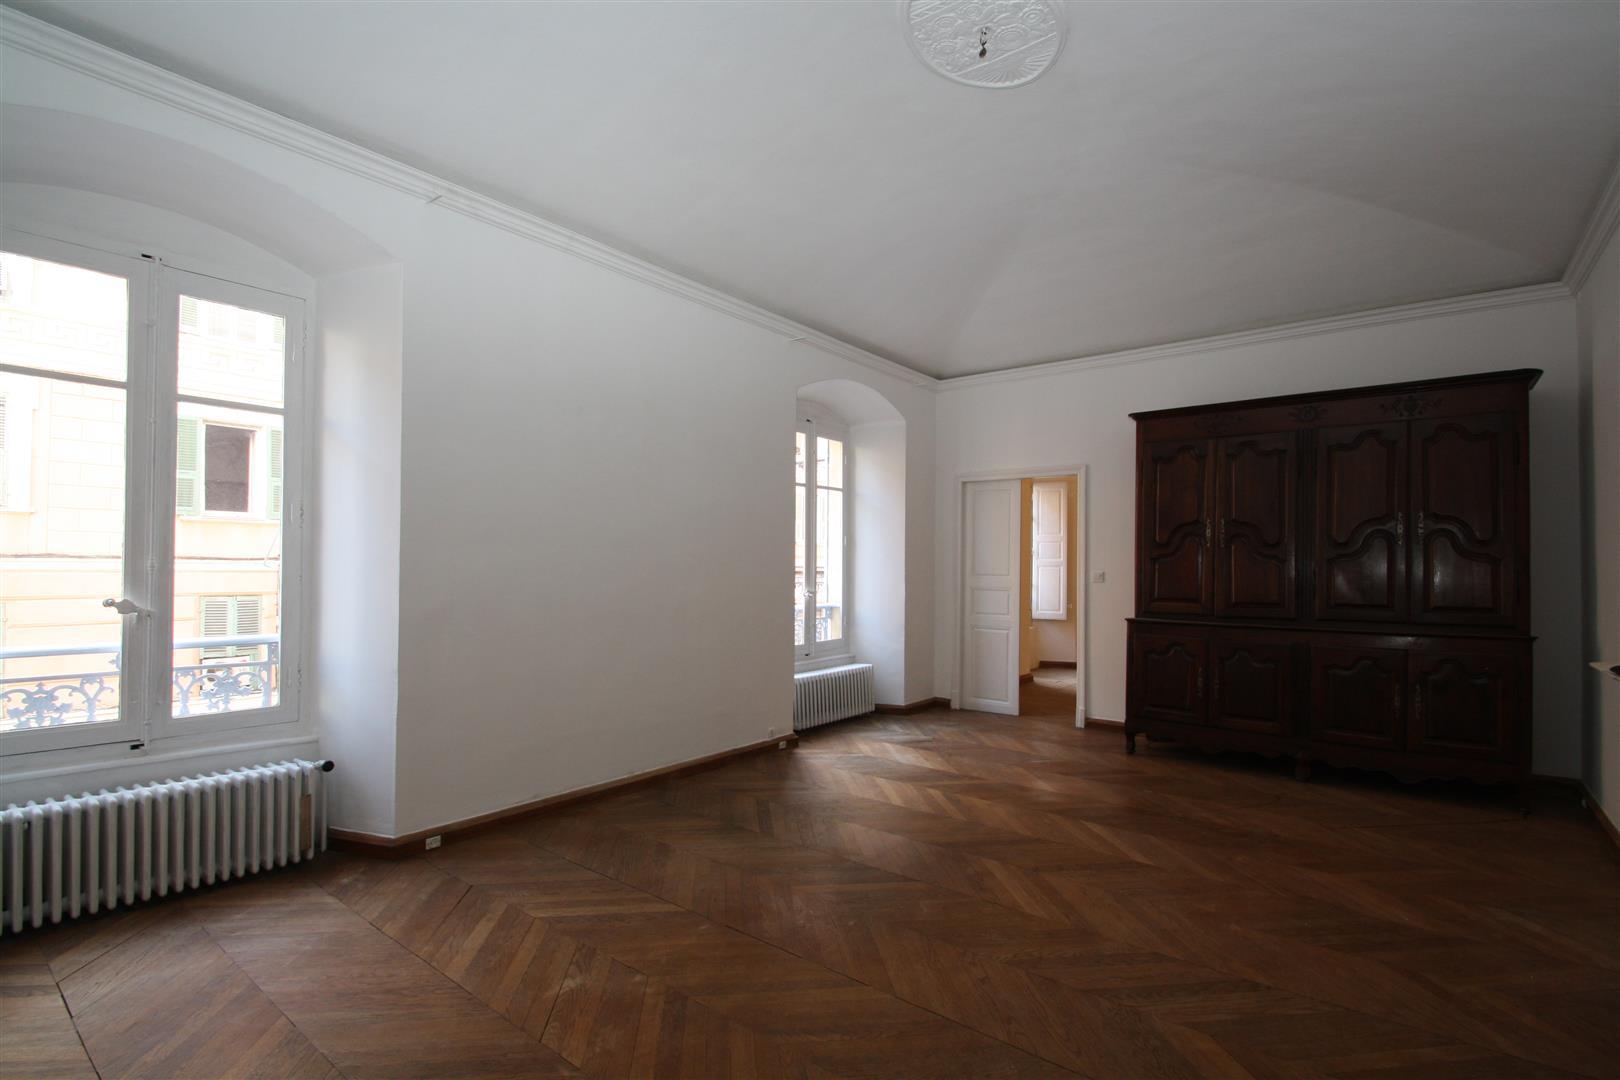 Appartement bastia agence immobili re bastia avec - Location appartement bastia ...